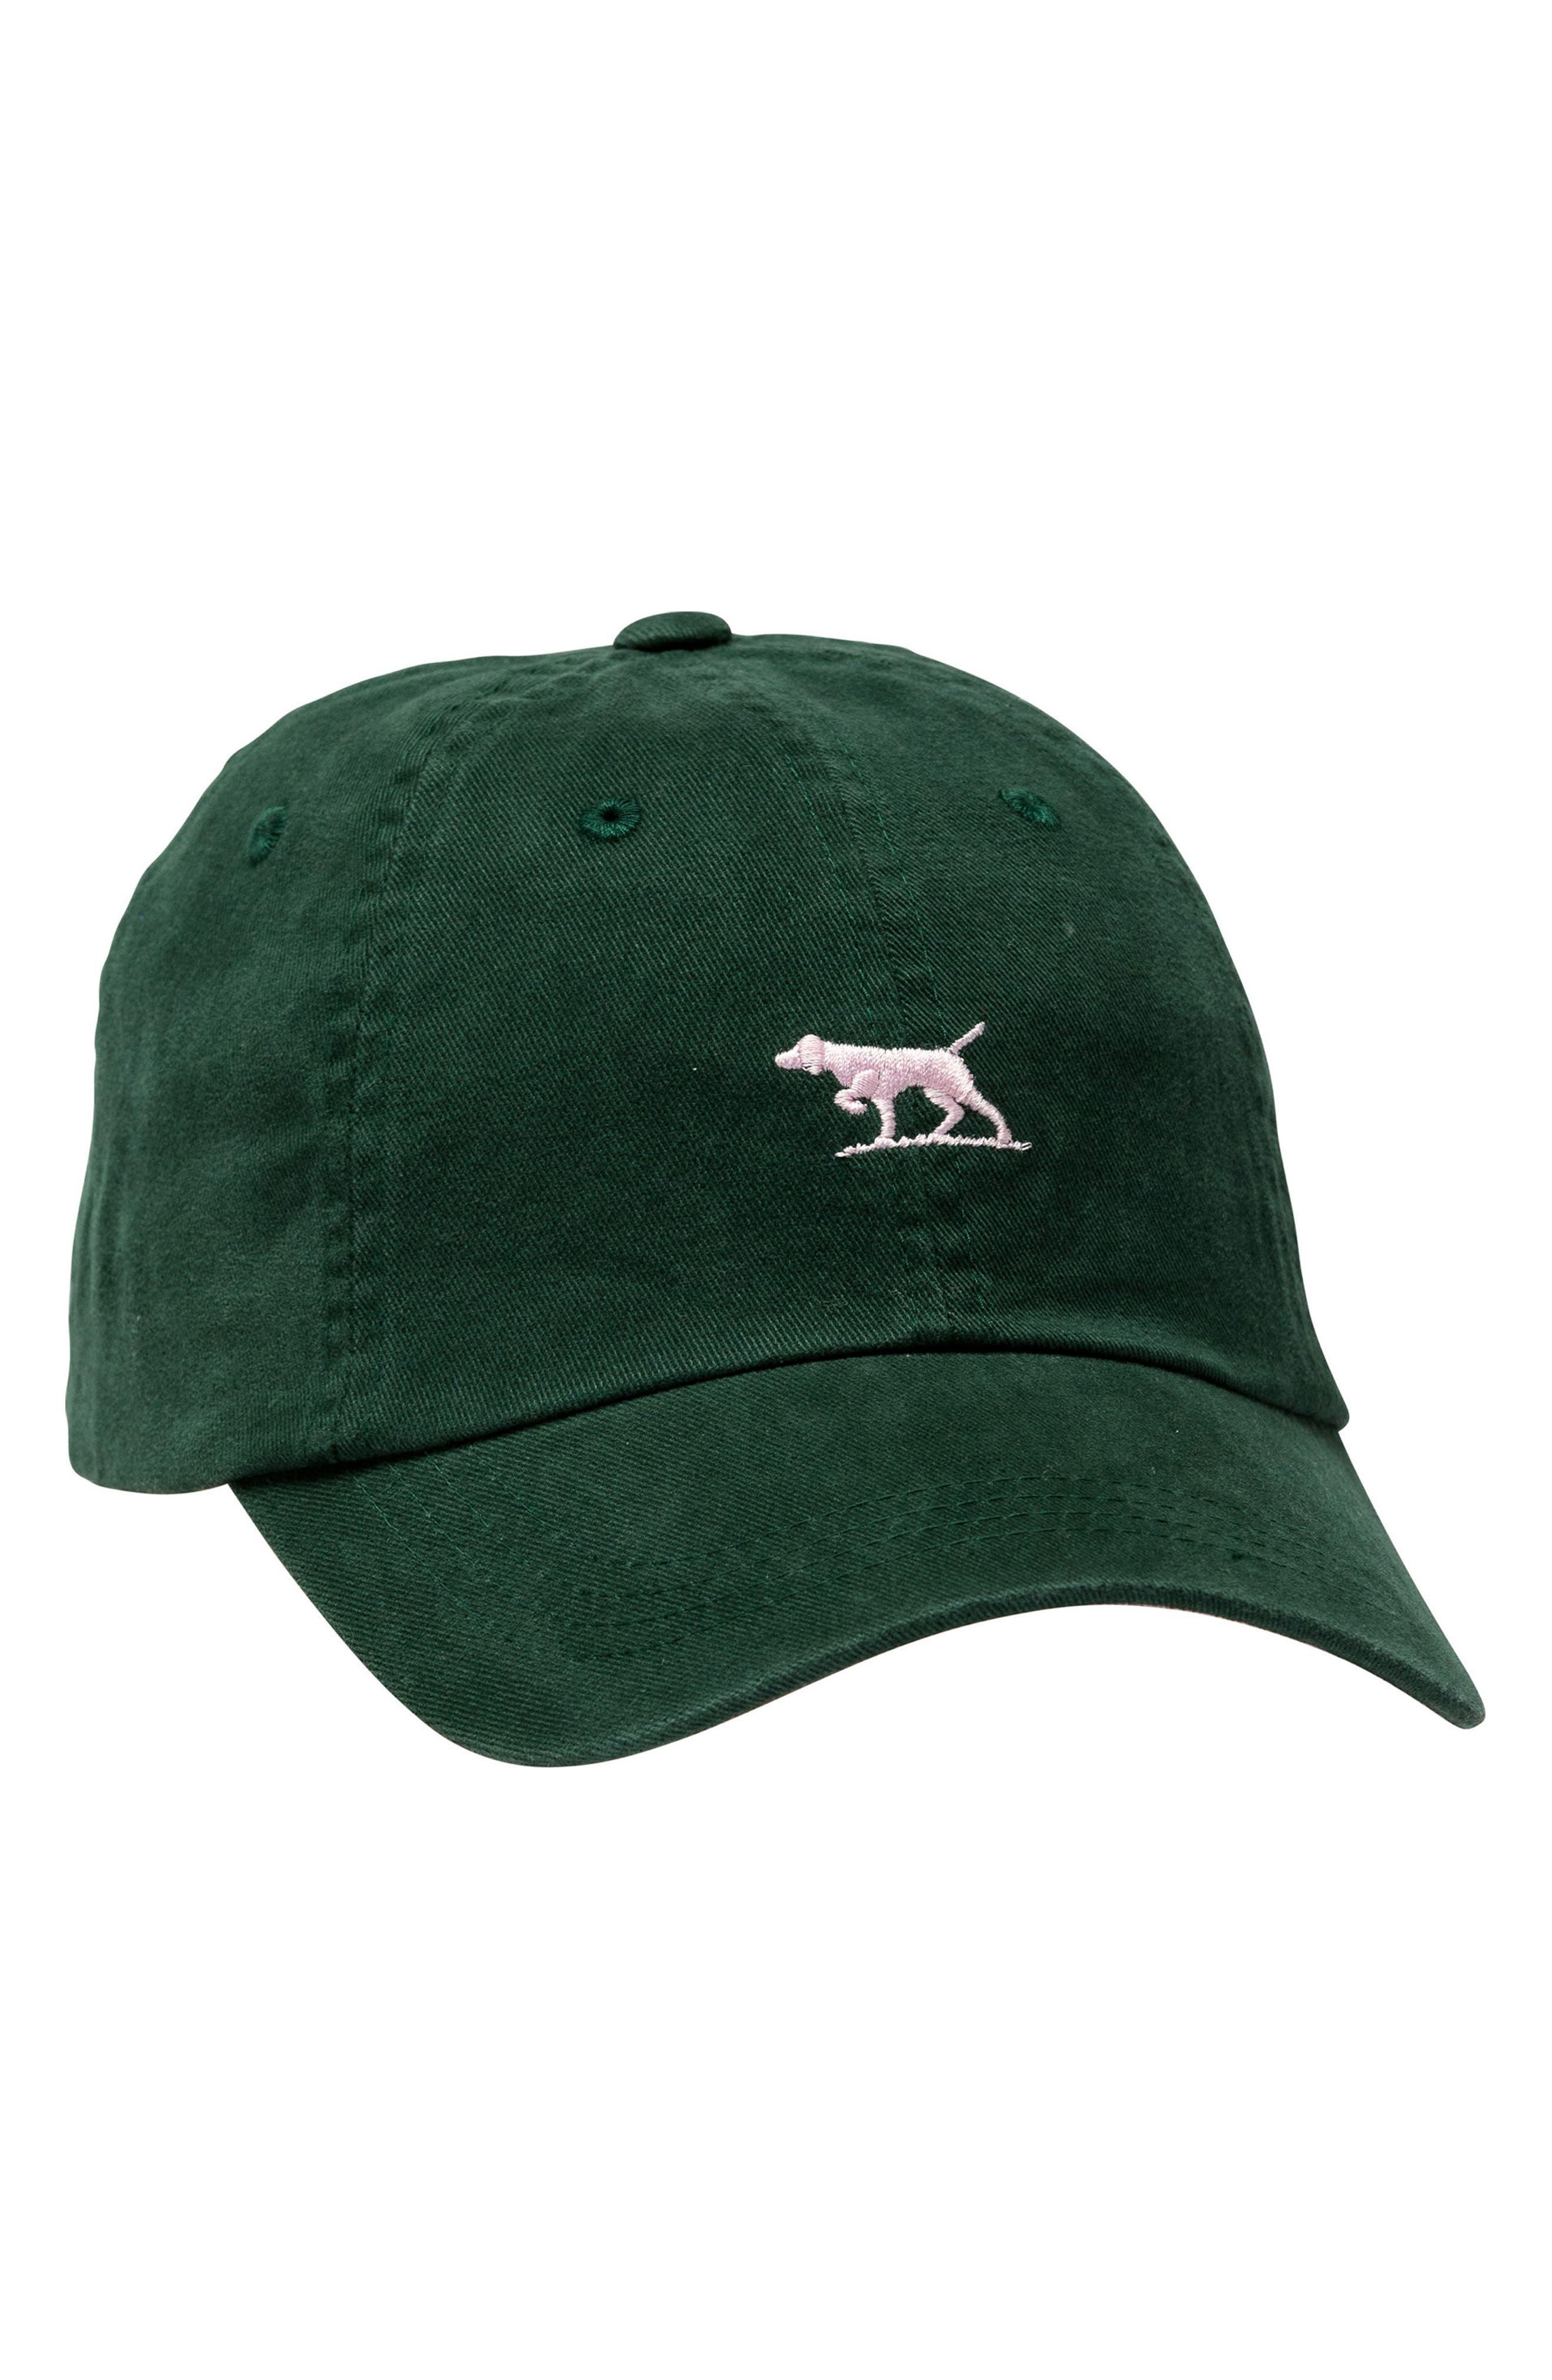 Ball Cap,                         Main,                         color, PINE